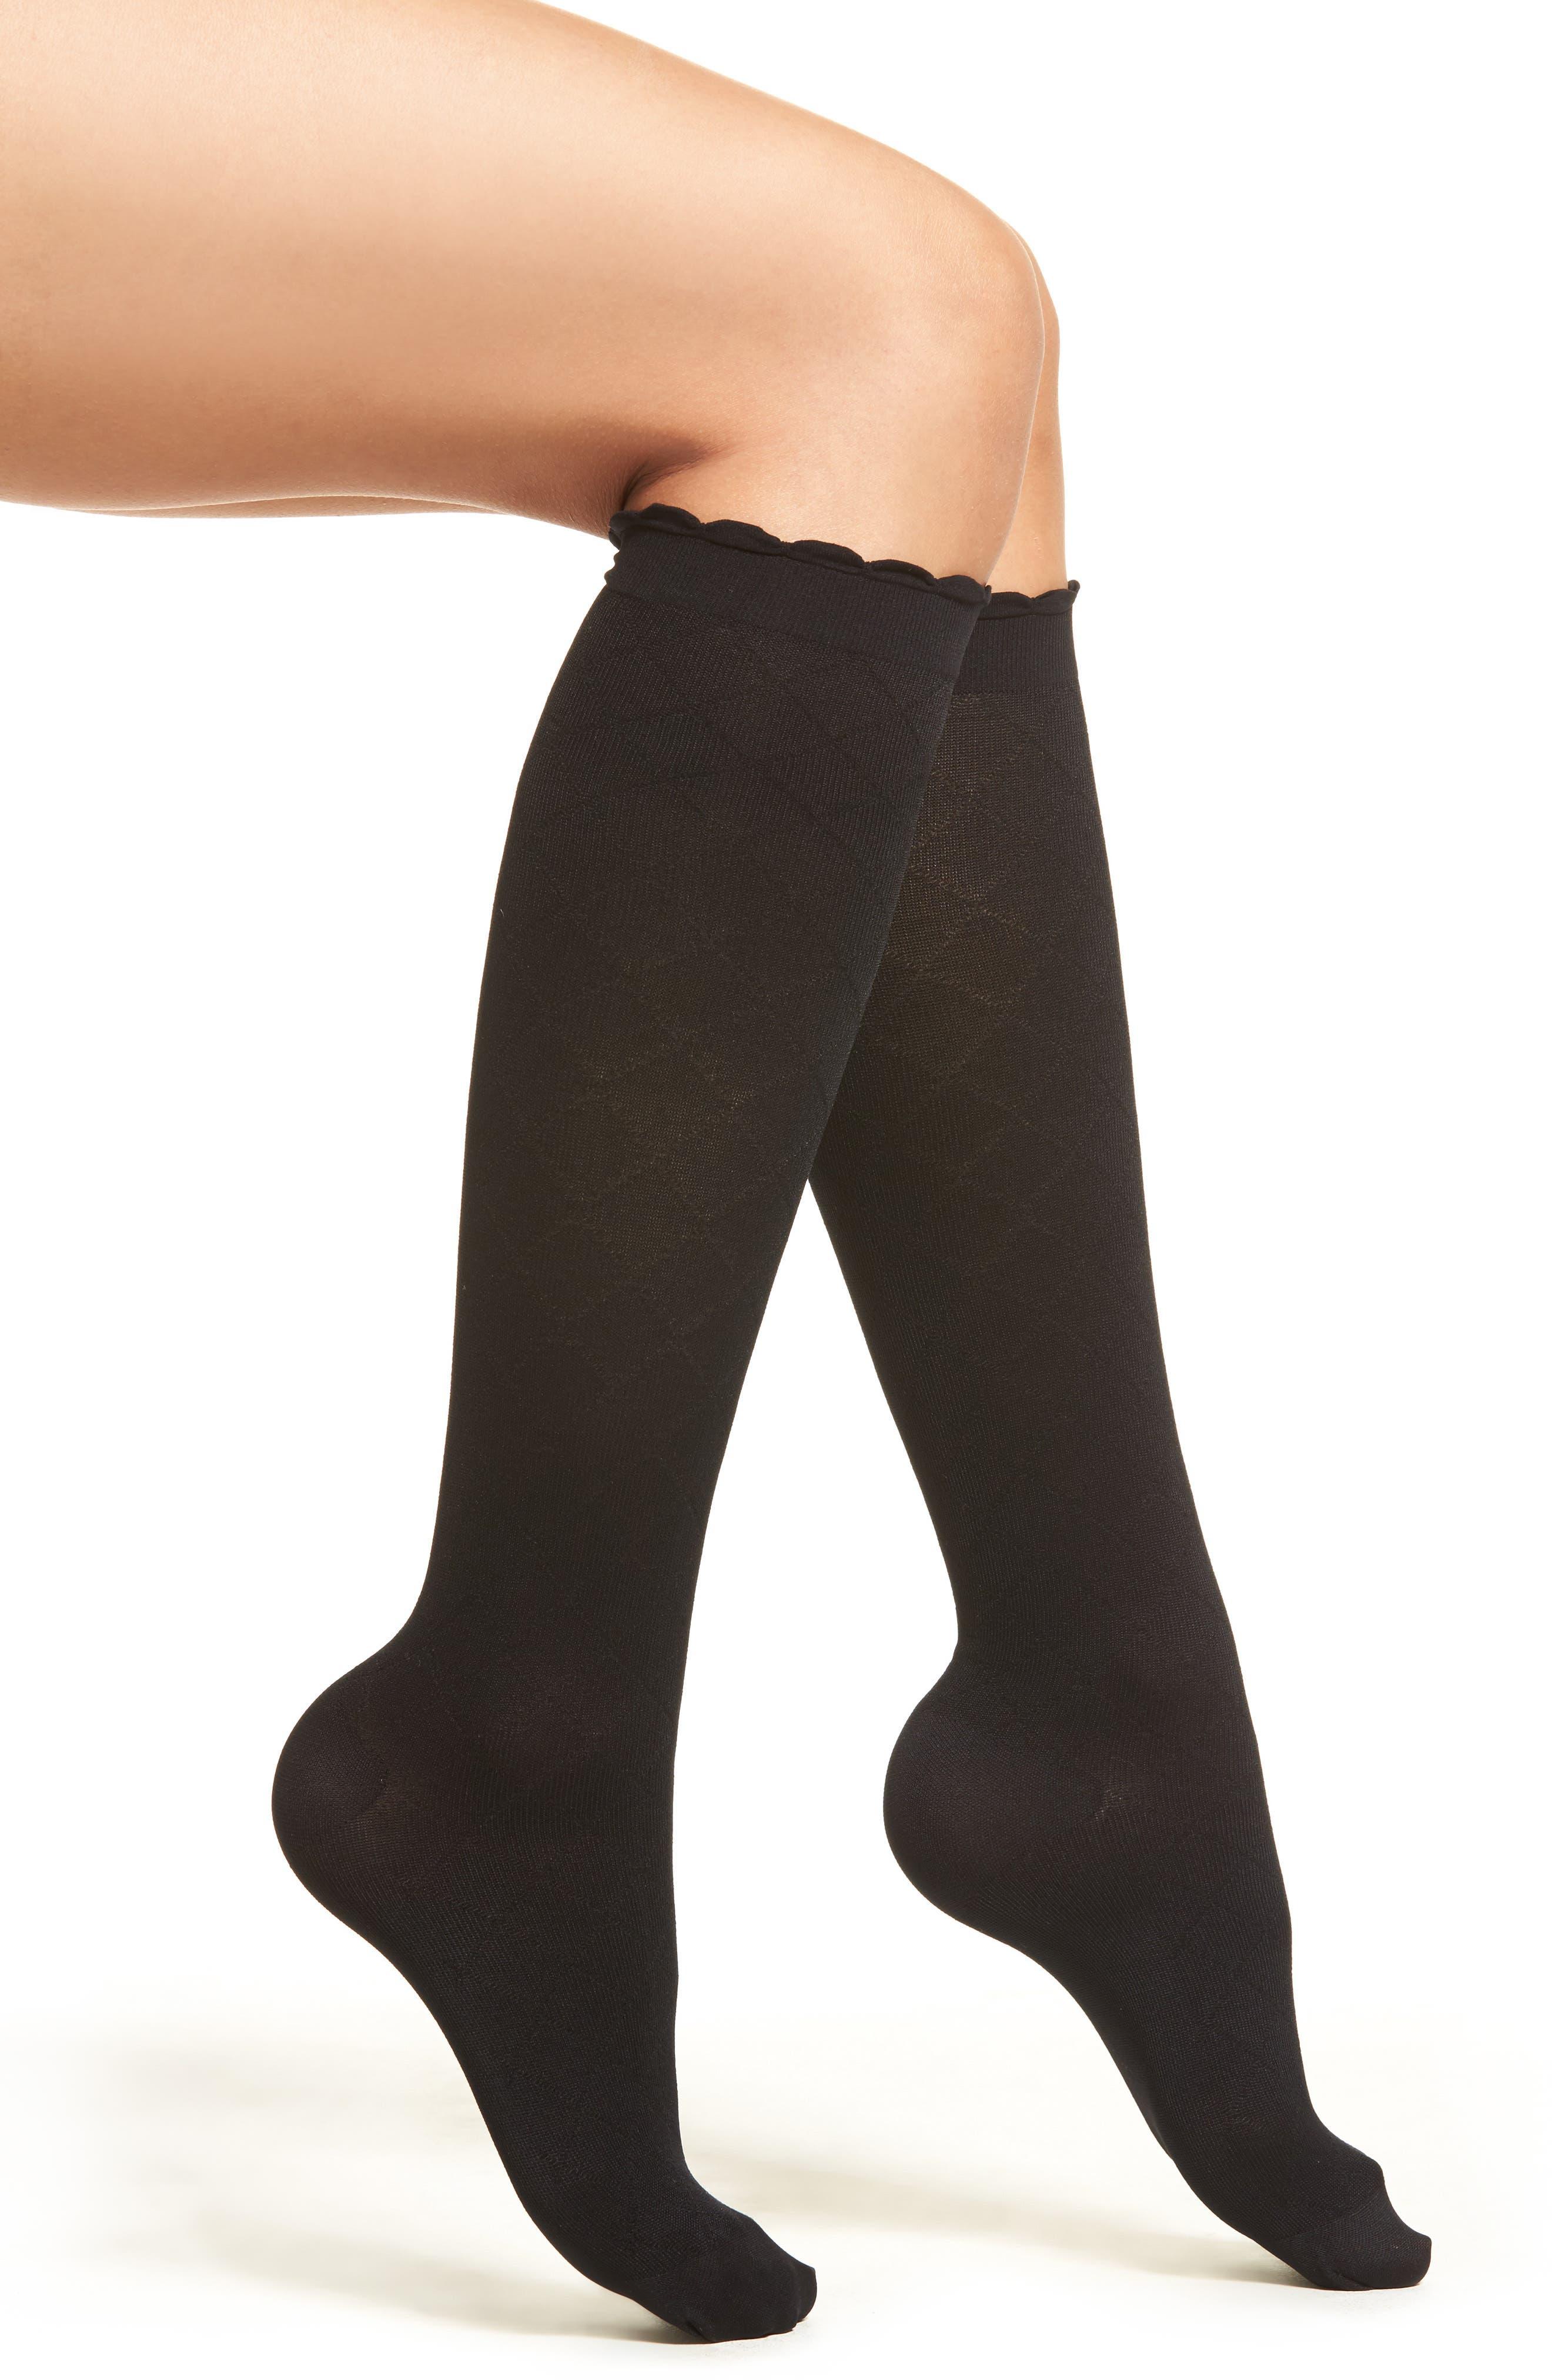 Diamond Compression Knee High Socks,                         Main,                         color, Black